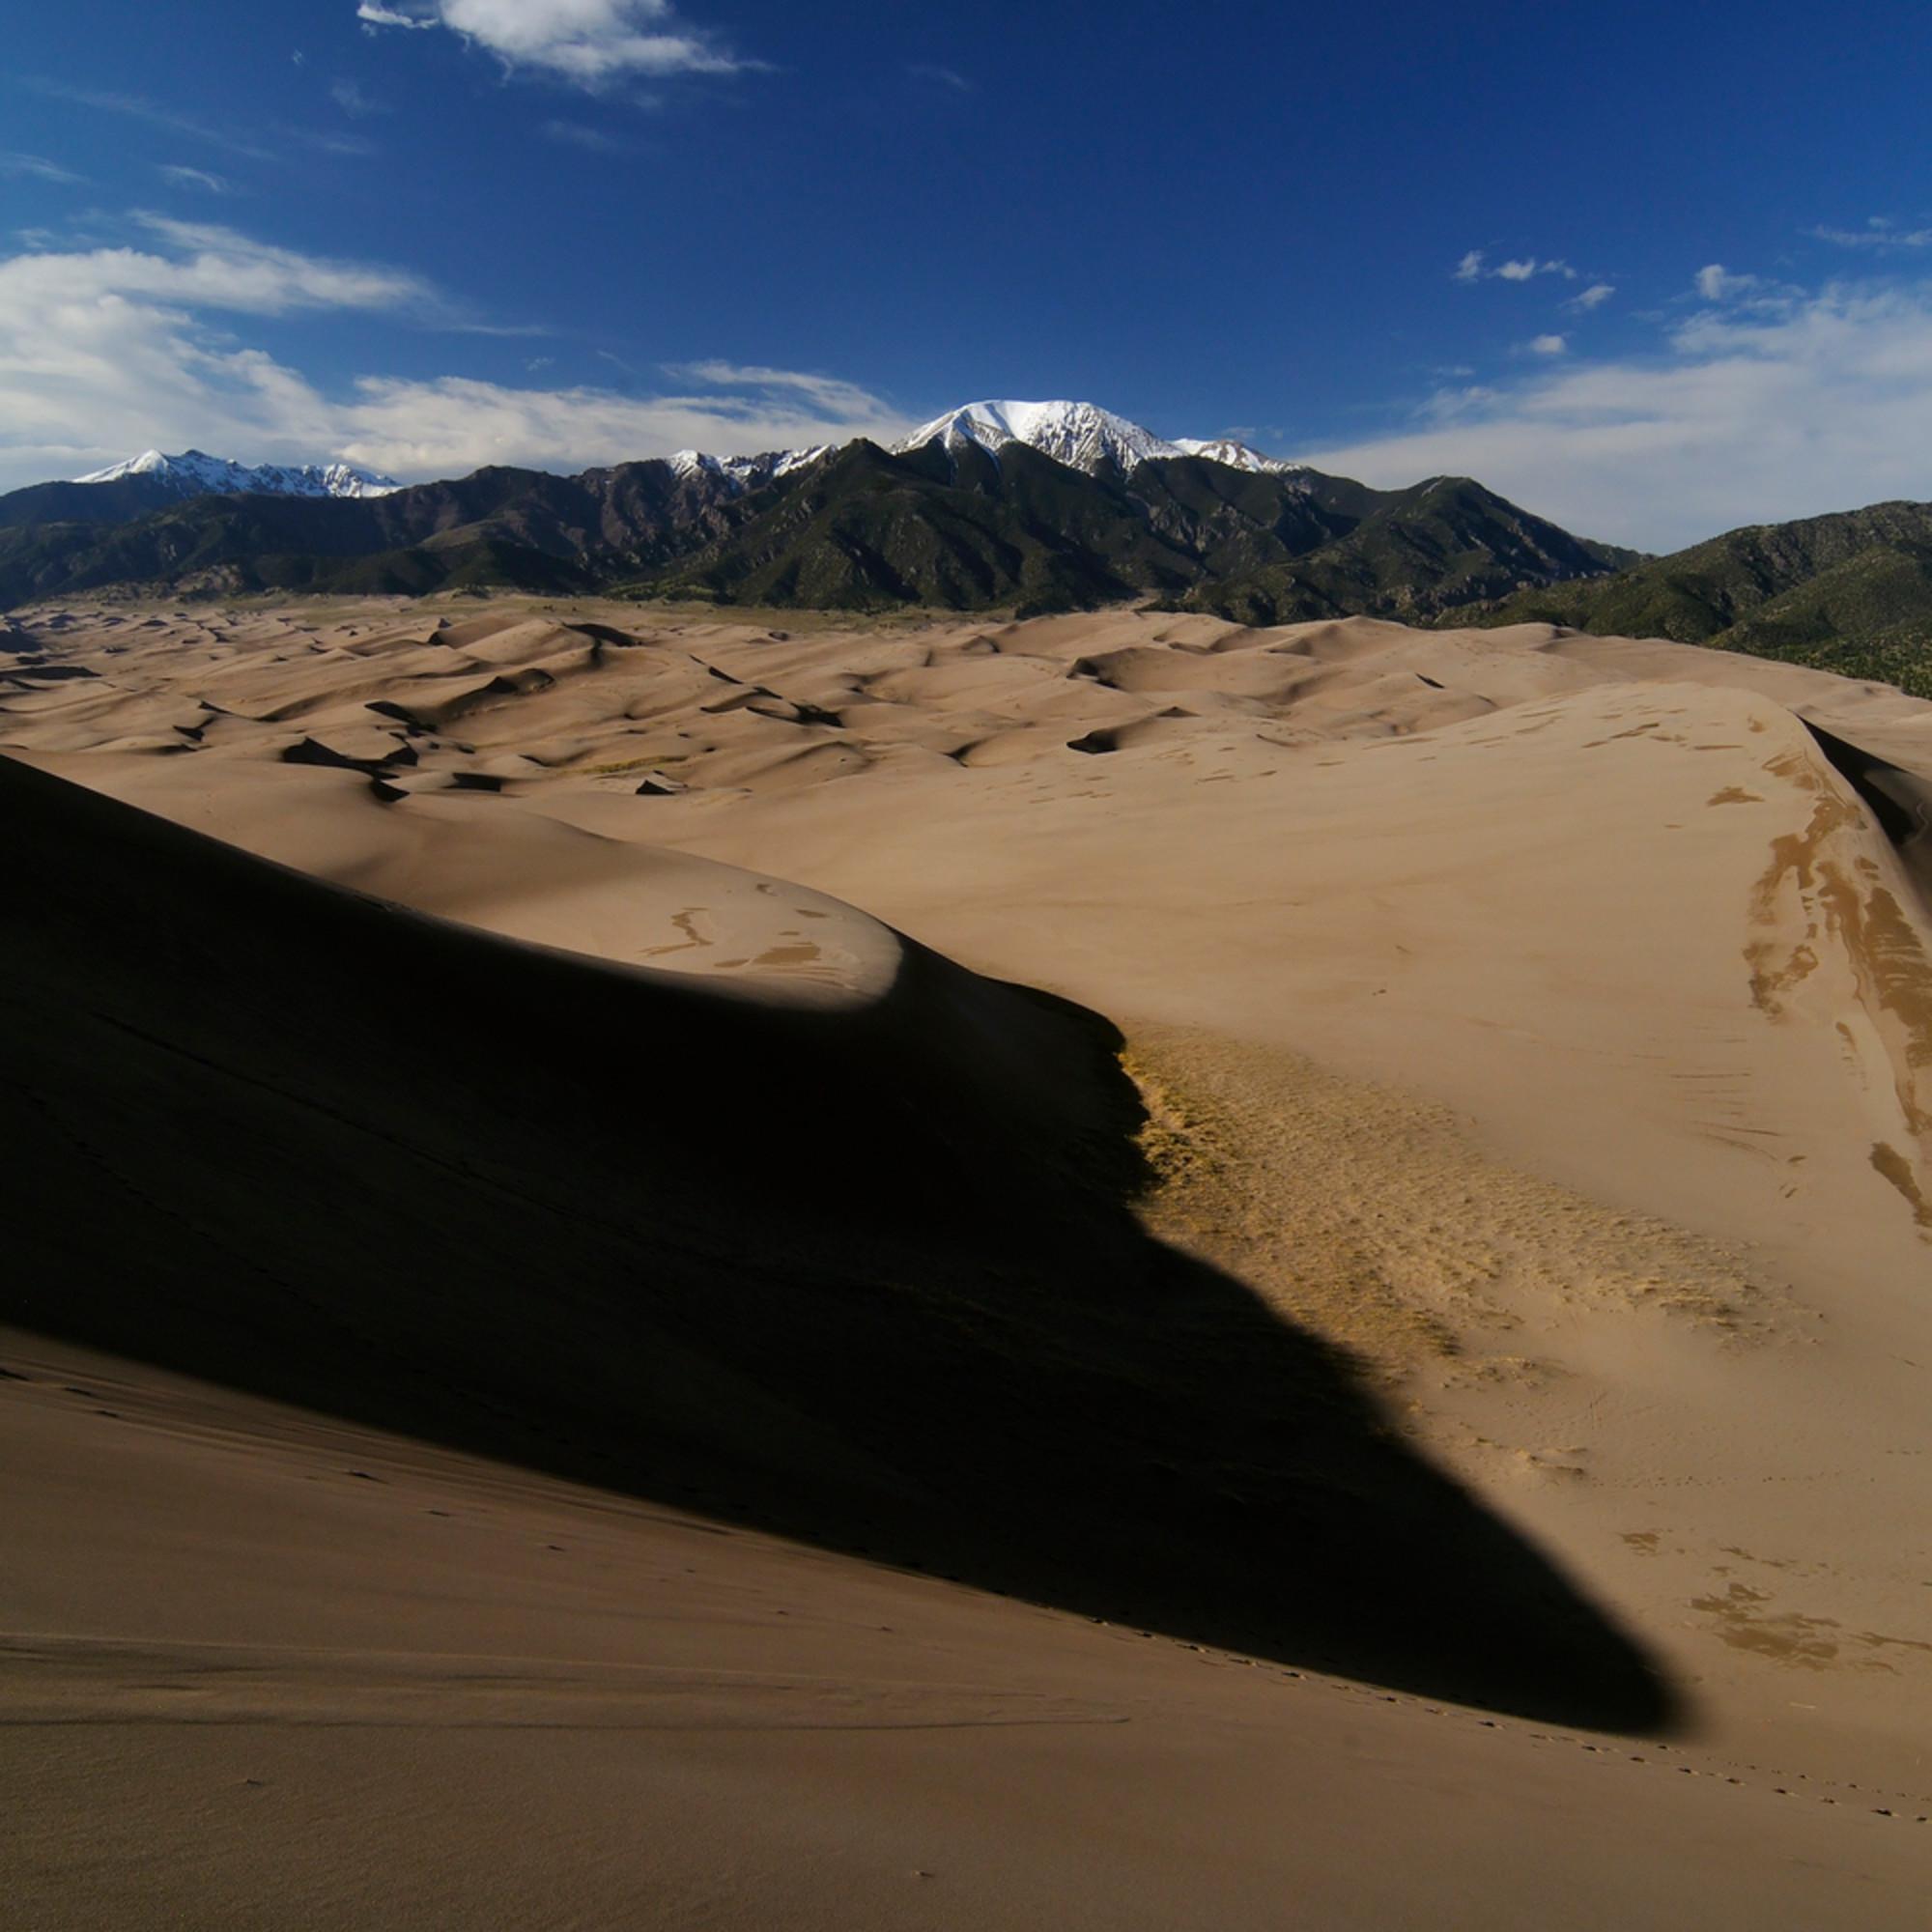 Sangre de cristo mountains from high dune 4 fttsto